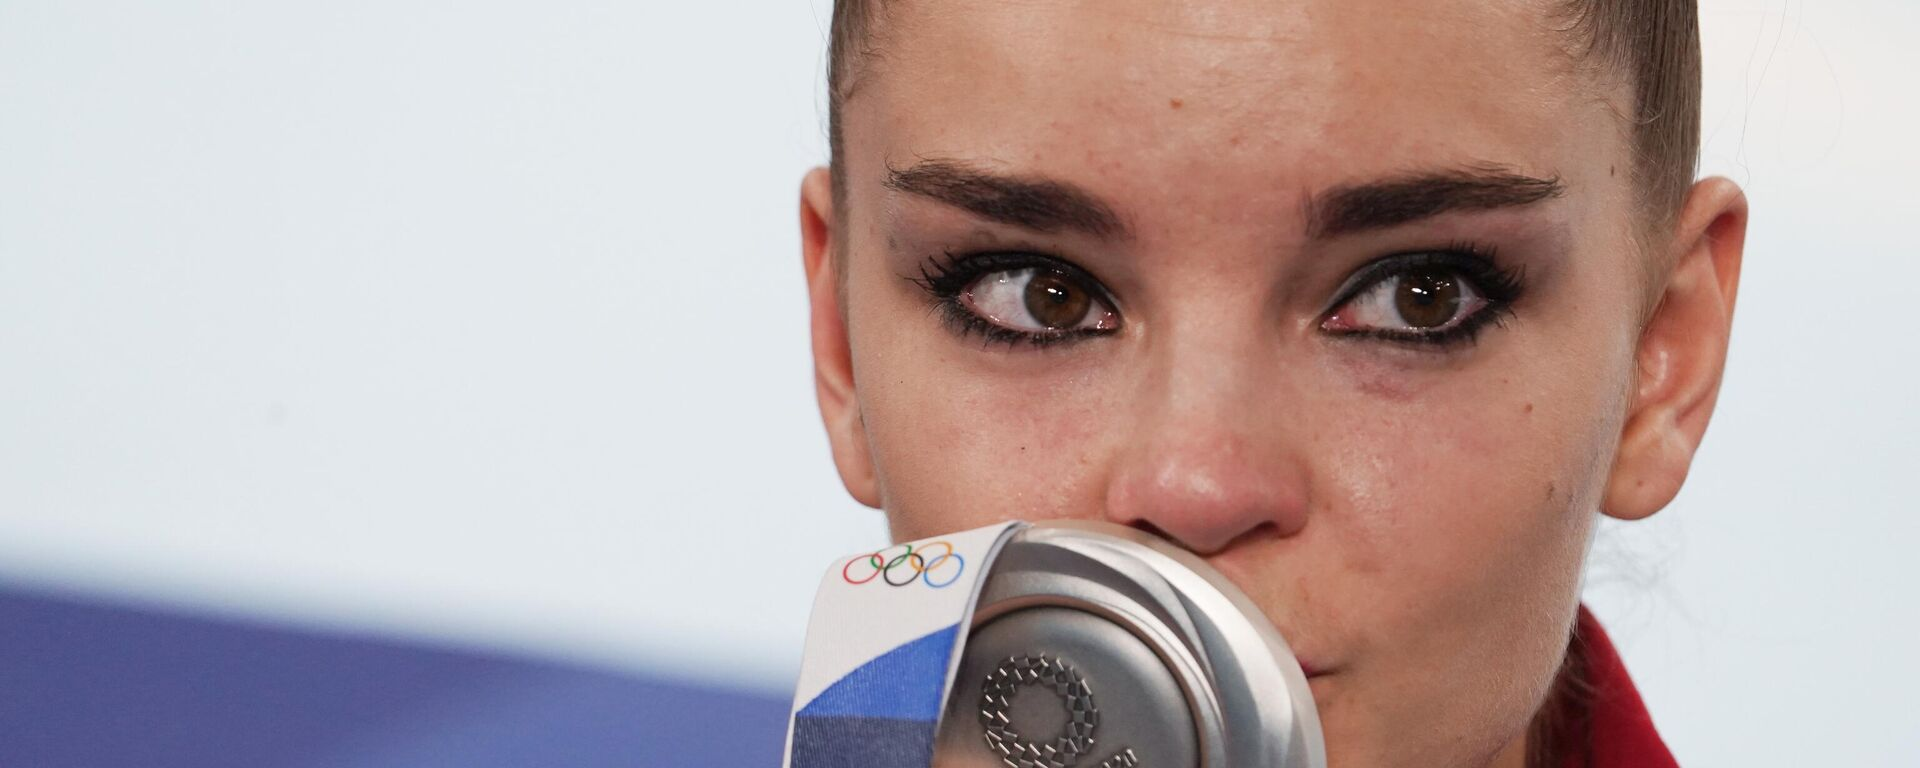 Dina Zaverina, gimnasta rusa, besa la medalla de plata que conquistó en los JJOO de Tokio - Sputnik Mundo, 1920, 07.08.2021